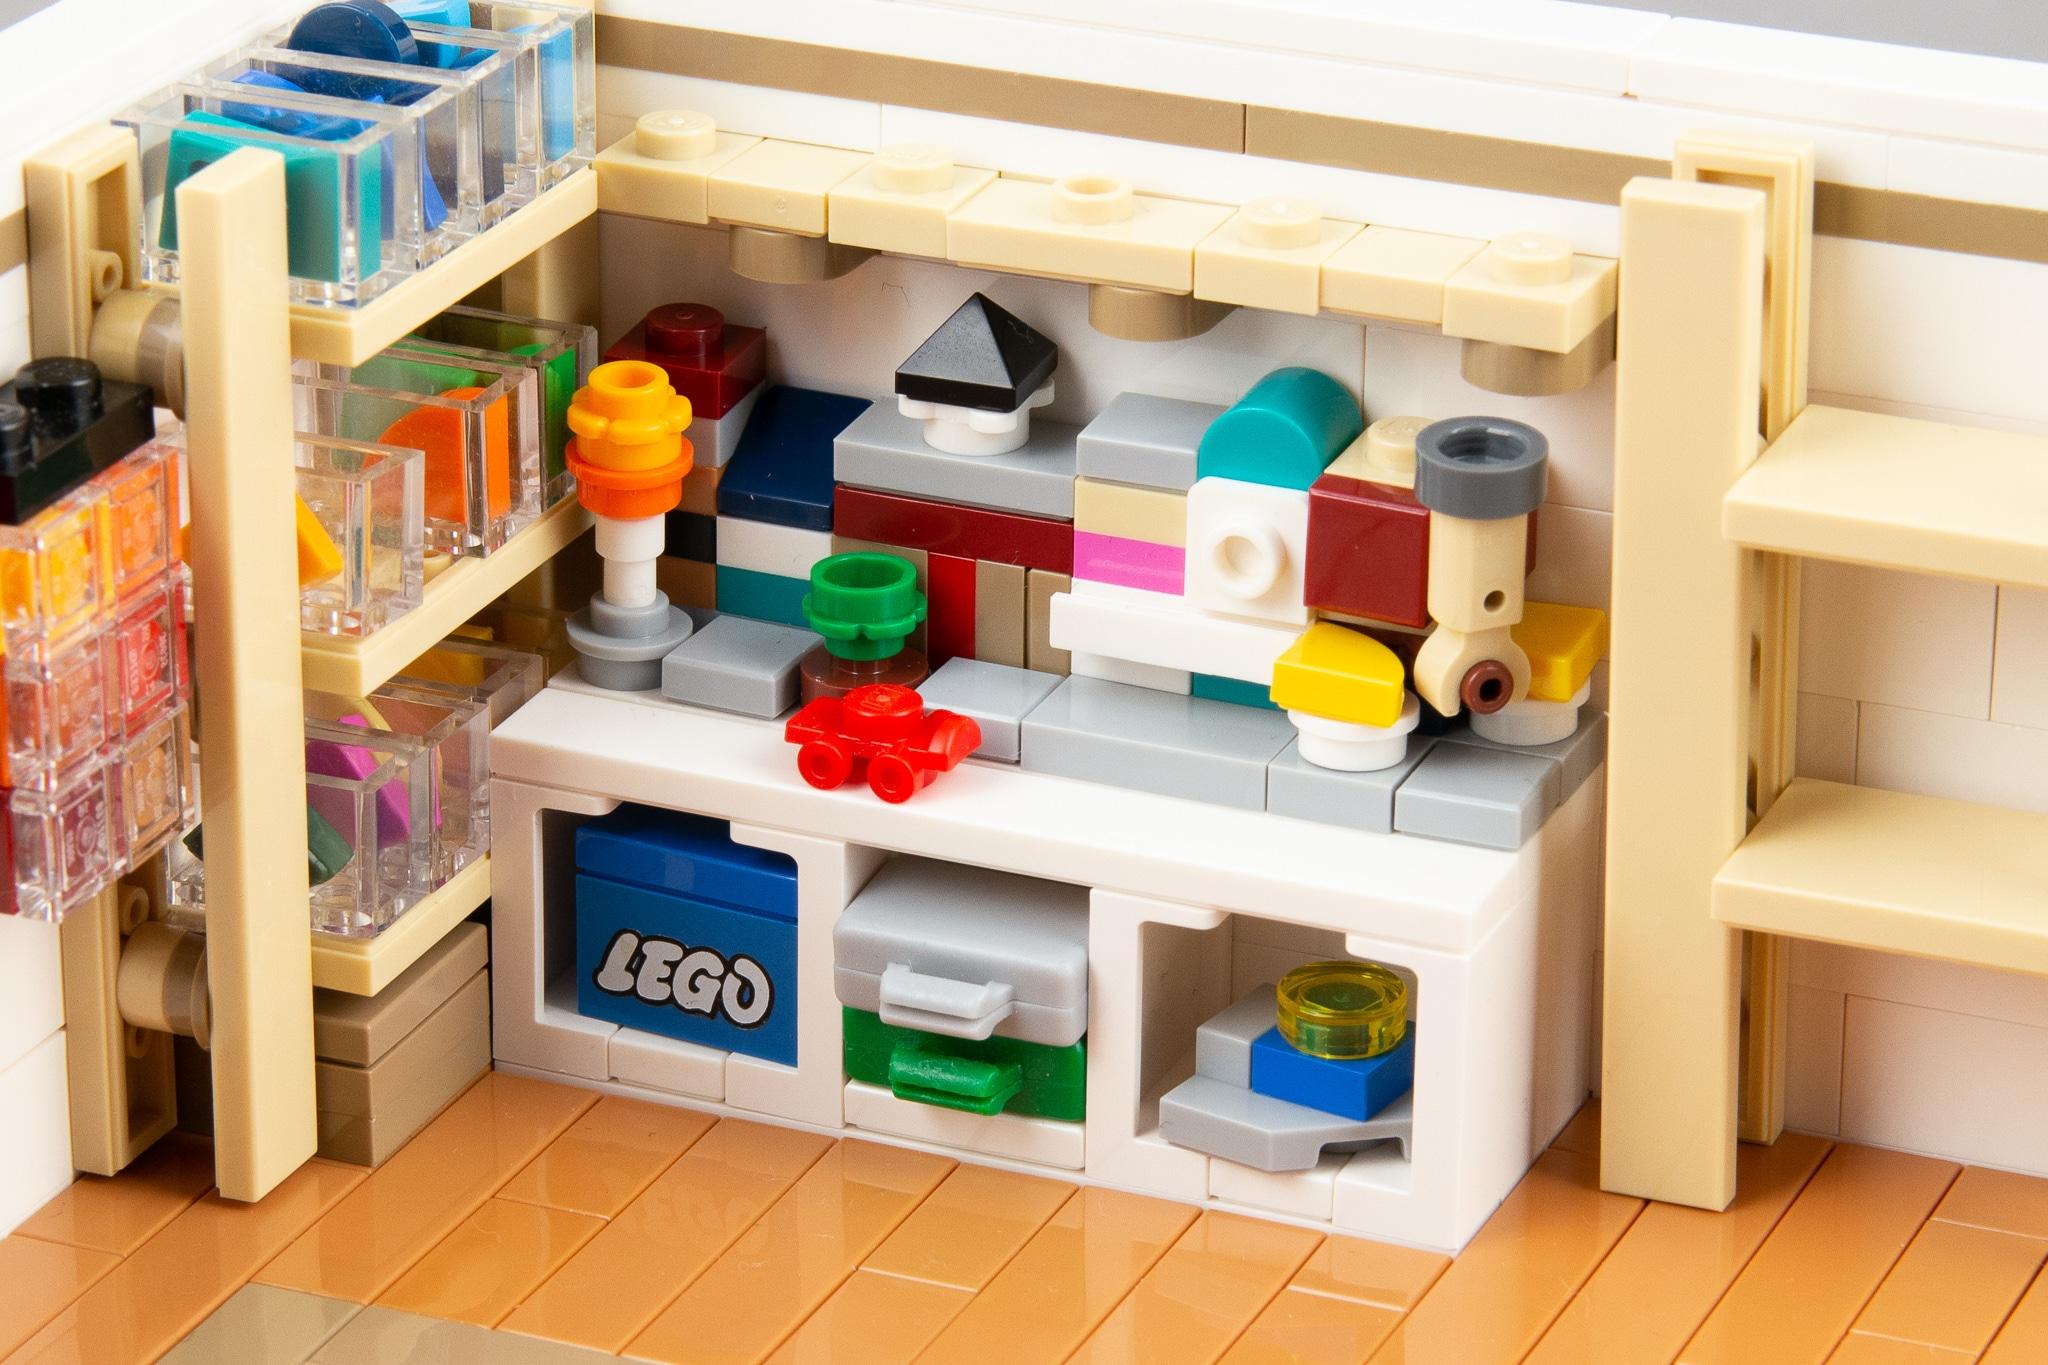 Moc Stonewars LEGO Zimmer Modular Buildings